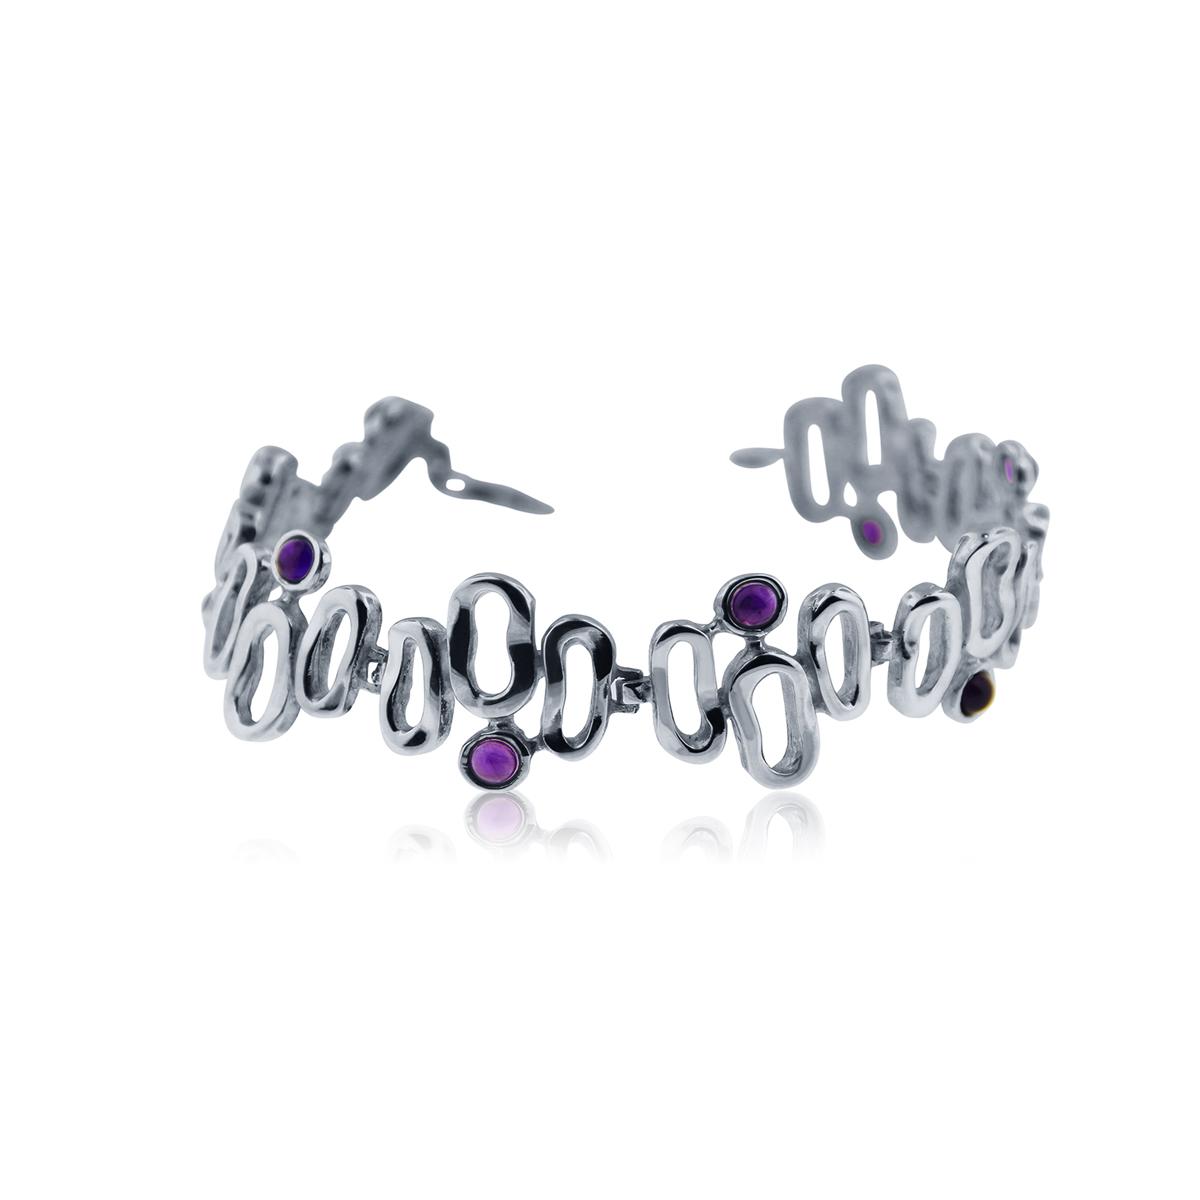 castle-rocks-and-jewelry-silver-stone-bracelet-audar